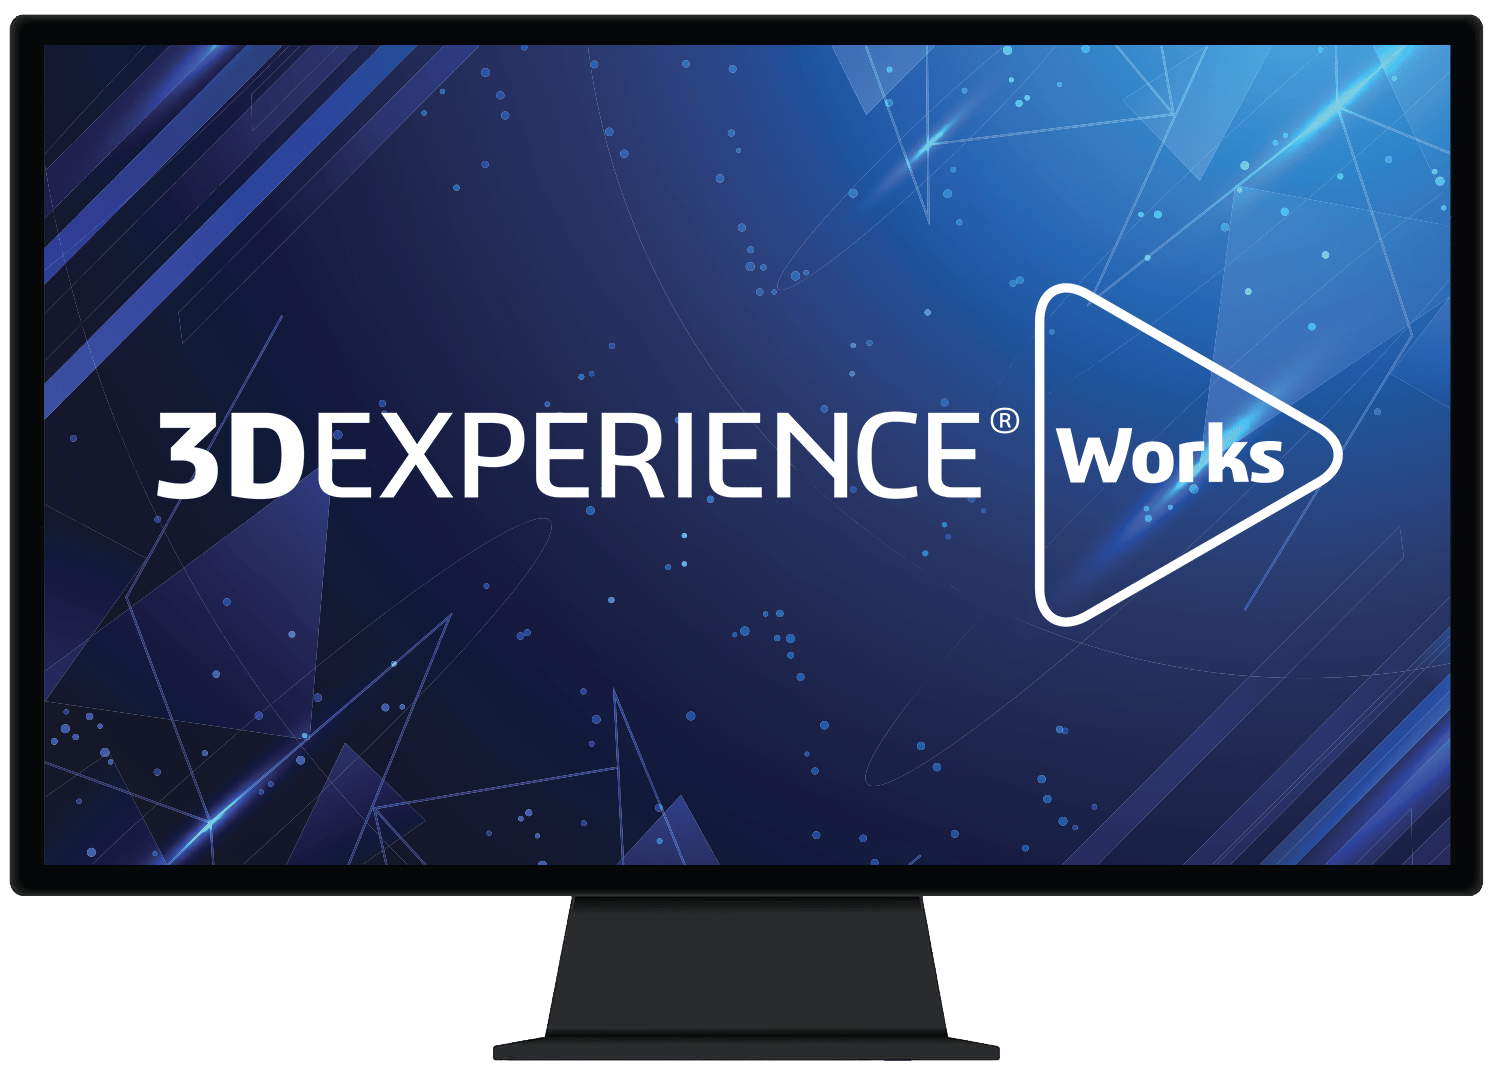 3DEXPERIENCE Works PC